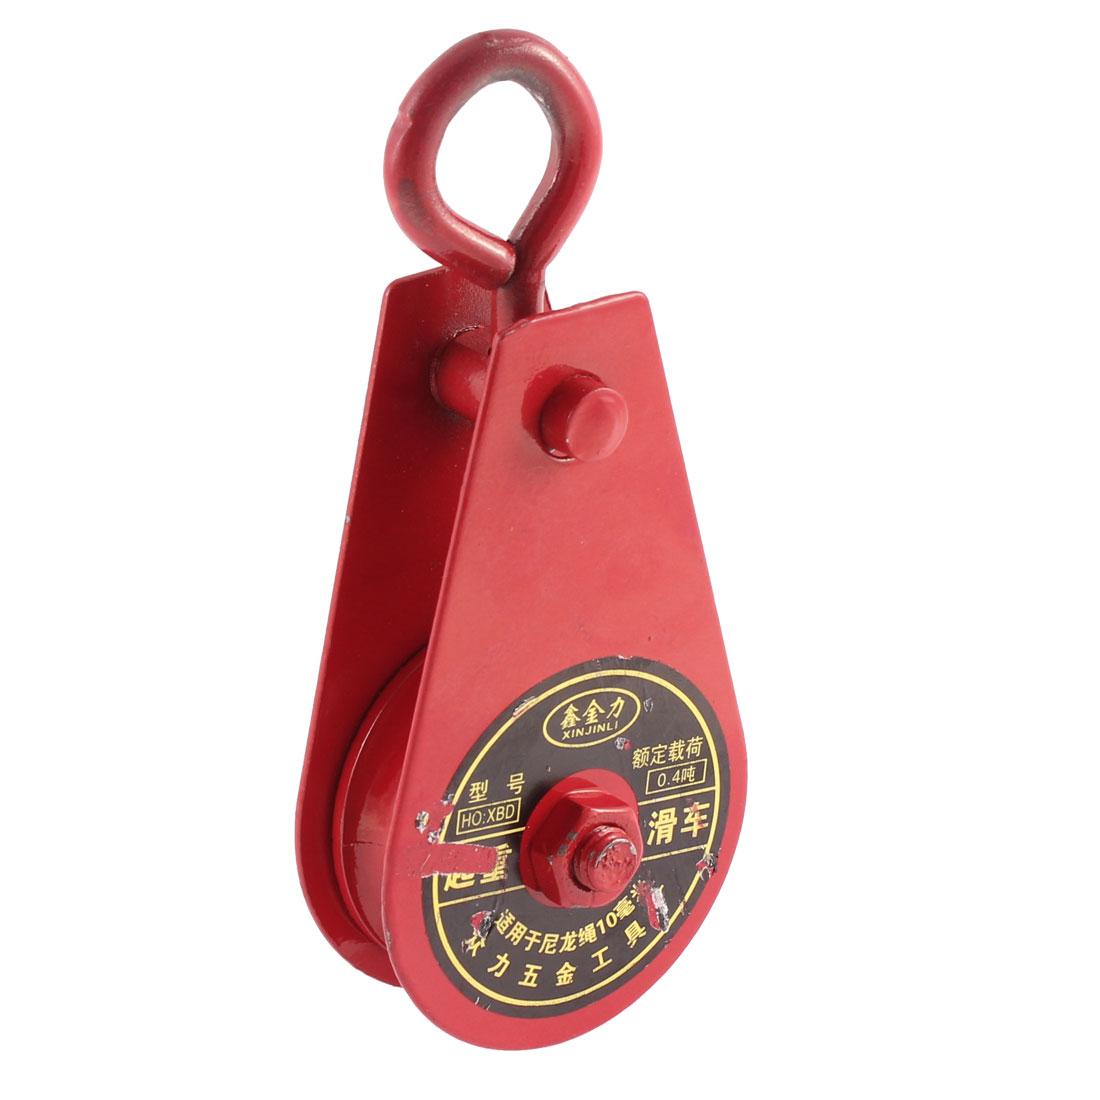 0.4 Ton Metal 55mm Dia Single Sheave Swivel Eye Rope Pulley Red